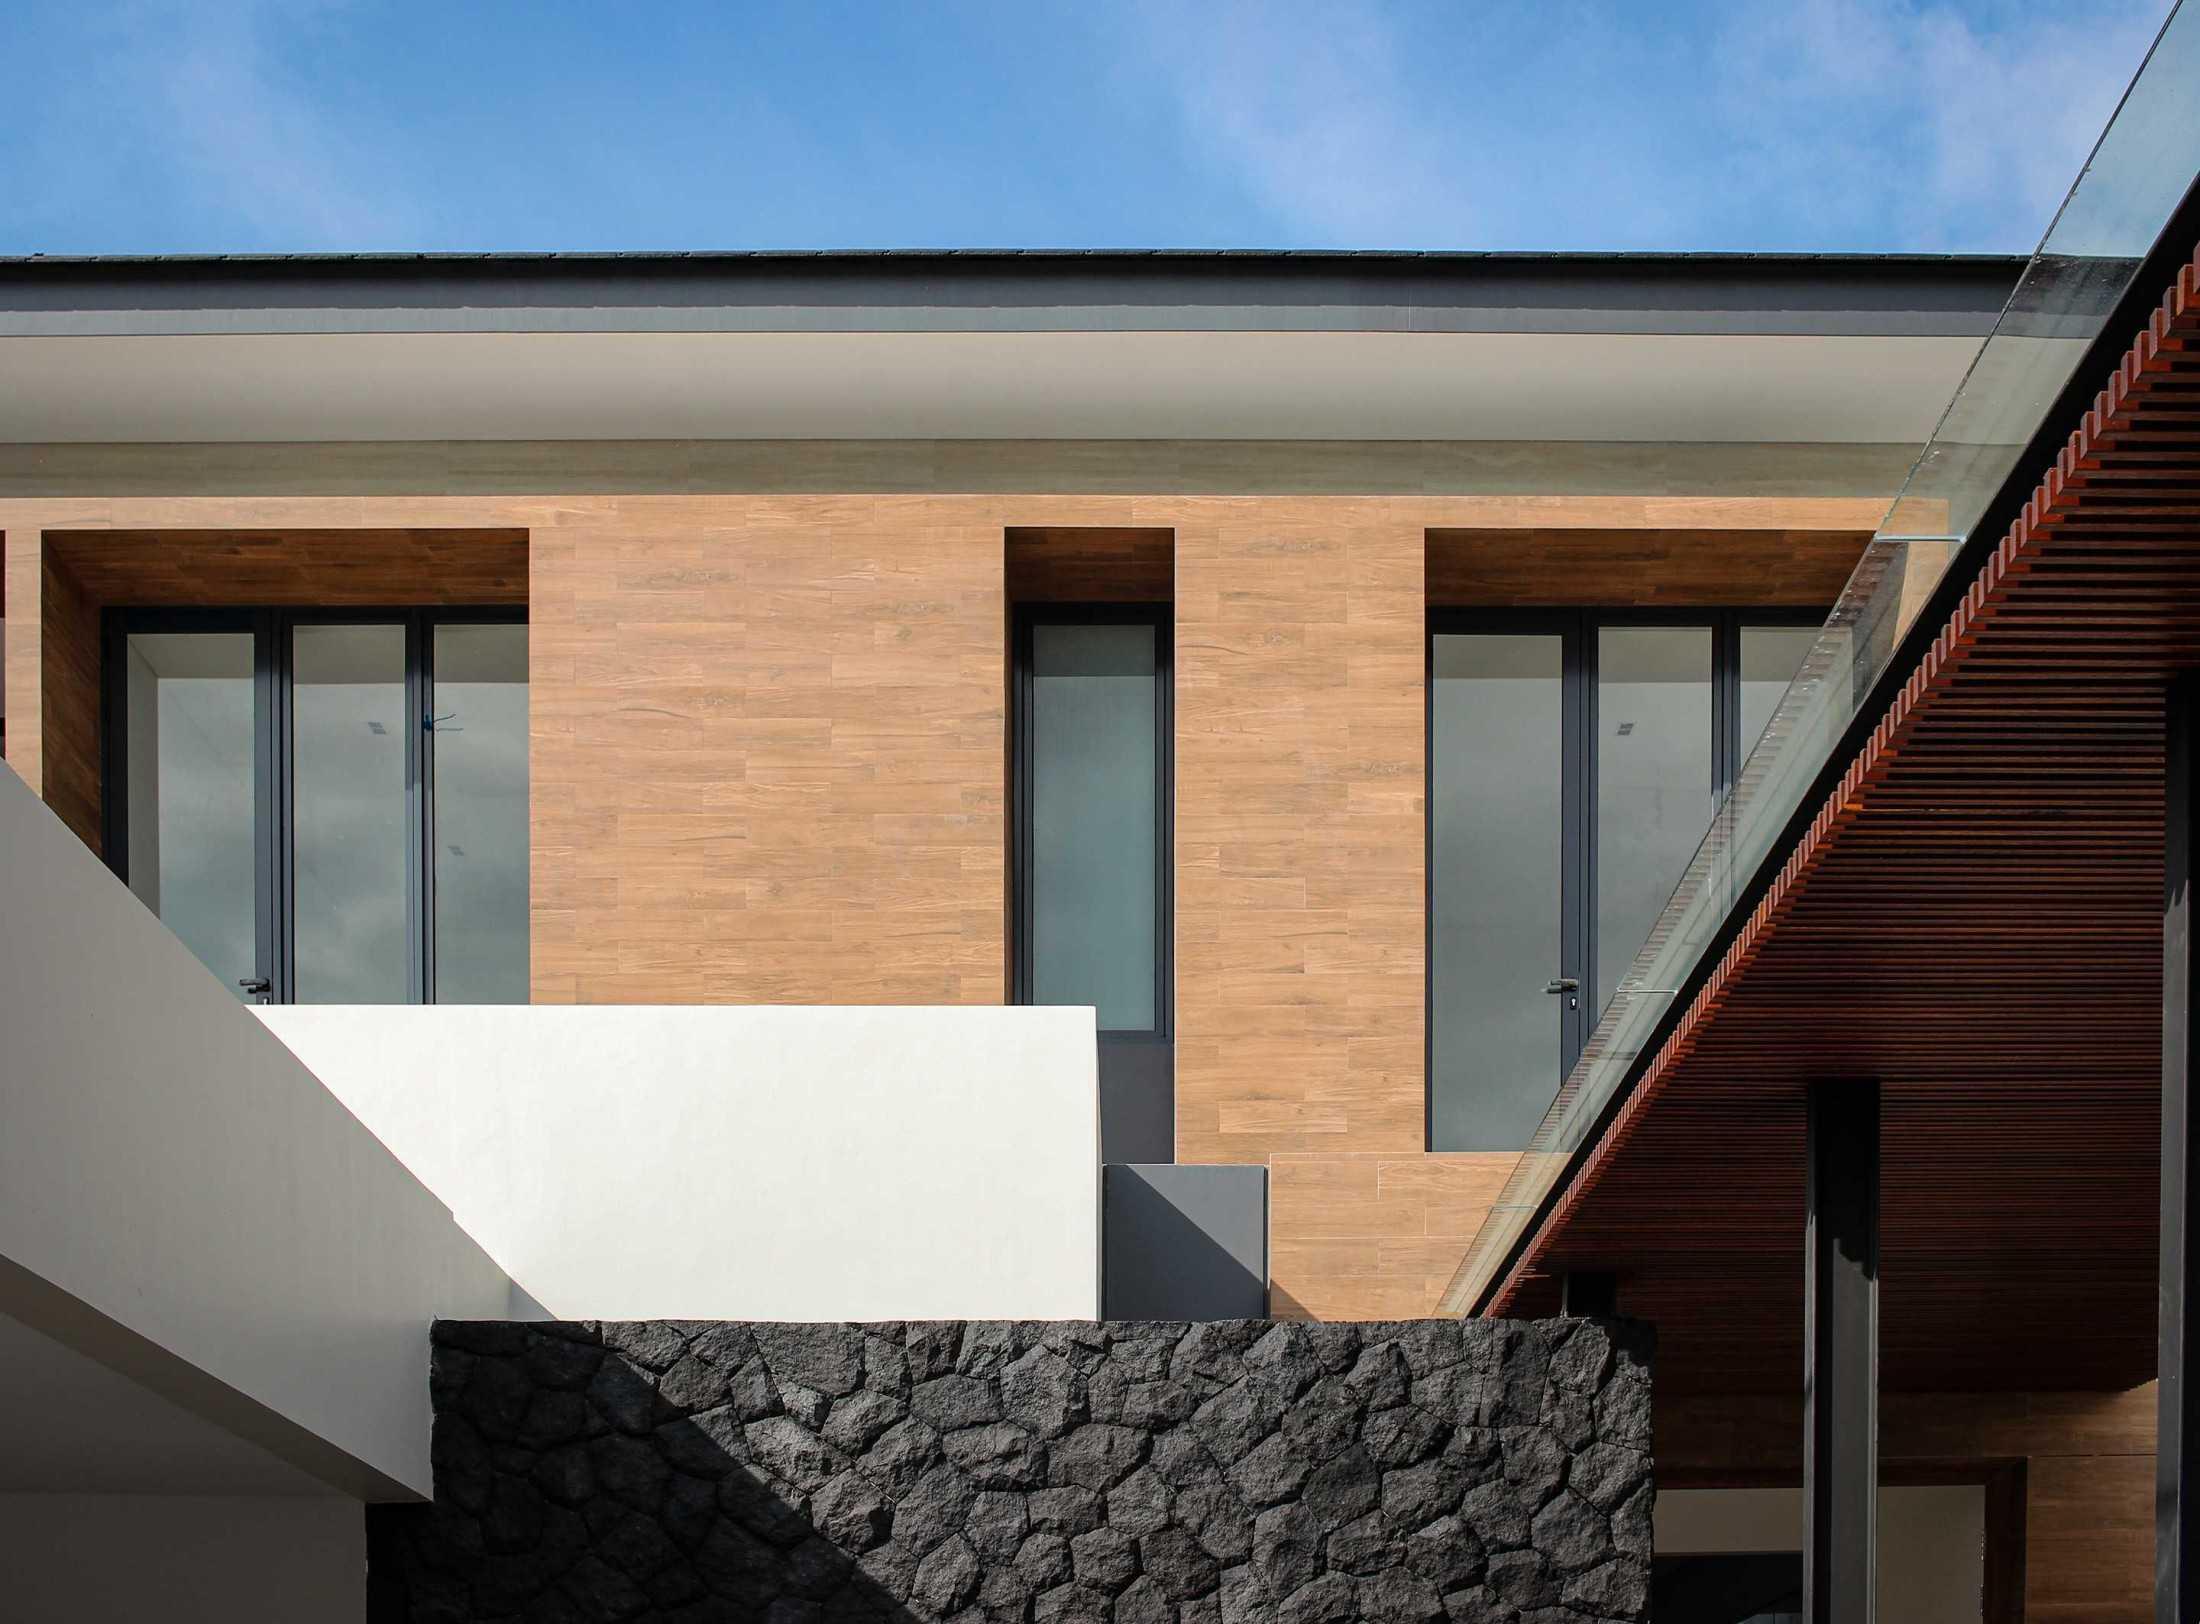 Y0 Design Architect S House Kec. Srono, Kabupaten Banyuwangi, Jawa Timur, Indonesia Kec. Srono, Kabupaten Banyuwangi, Jawa Timur, Indonesia Yohanes-Iswara-Limandjaya-S-House  121094